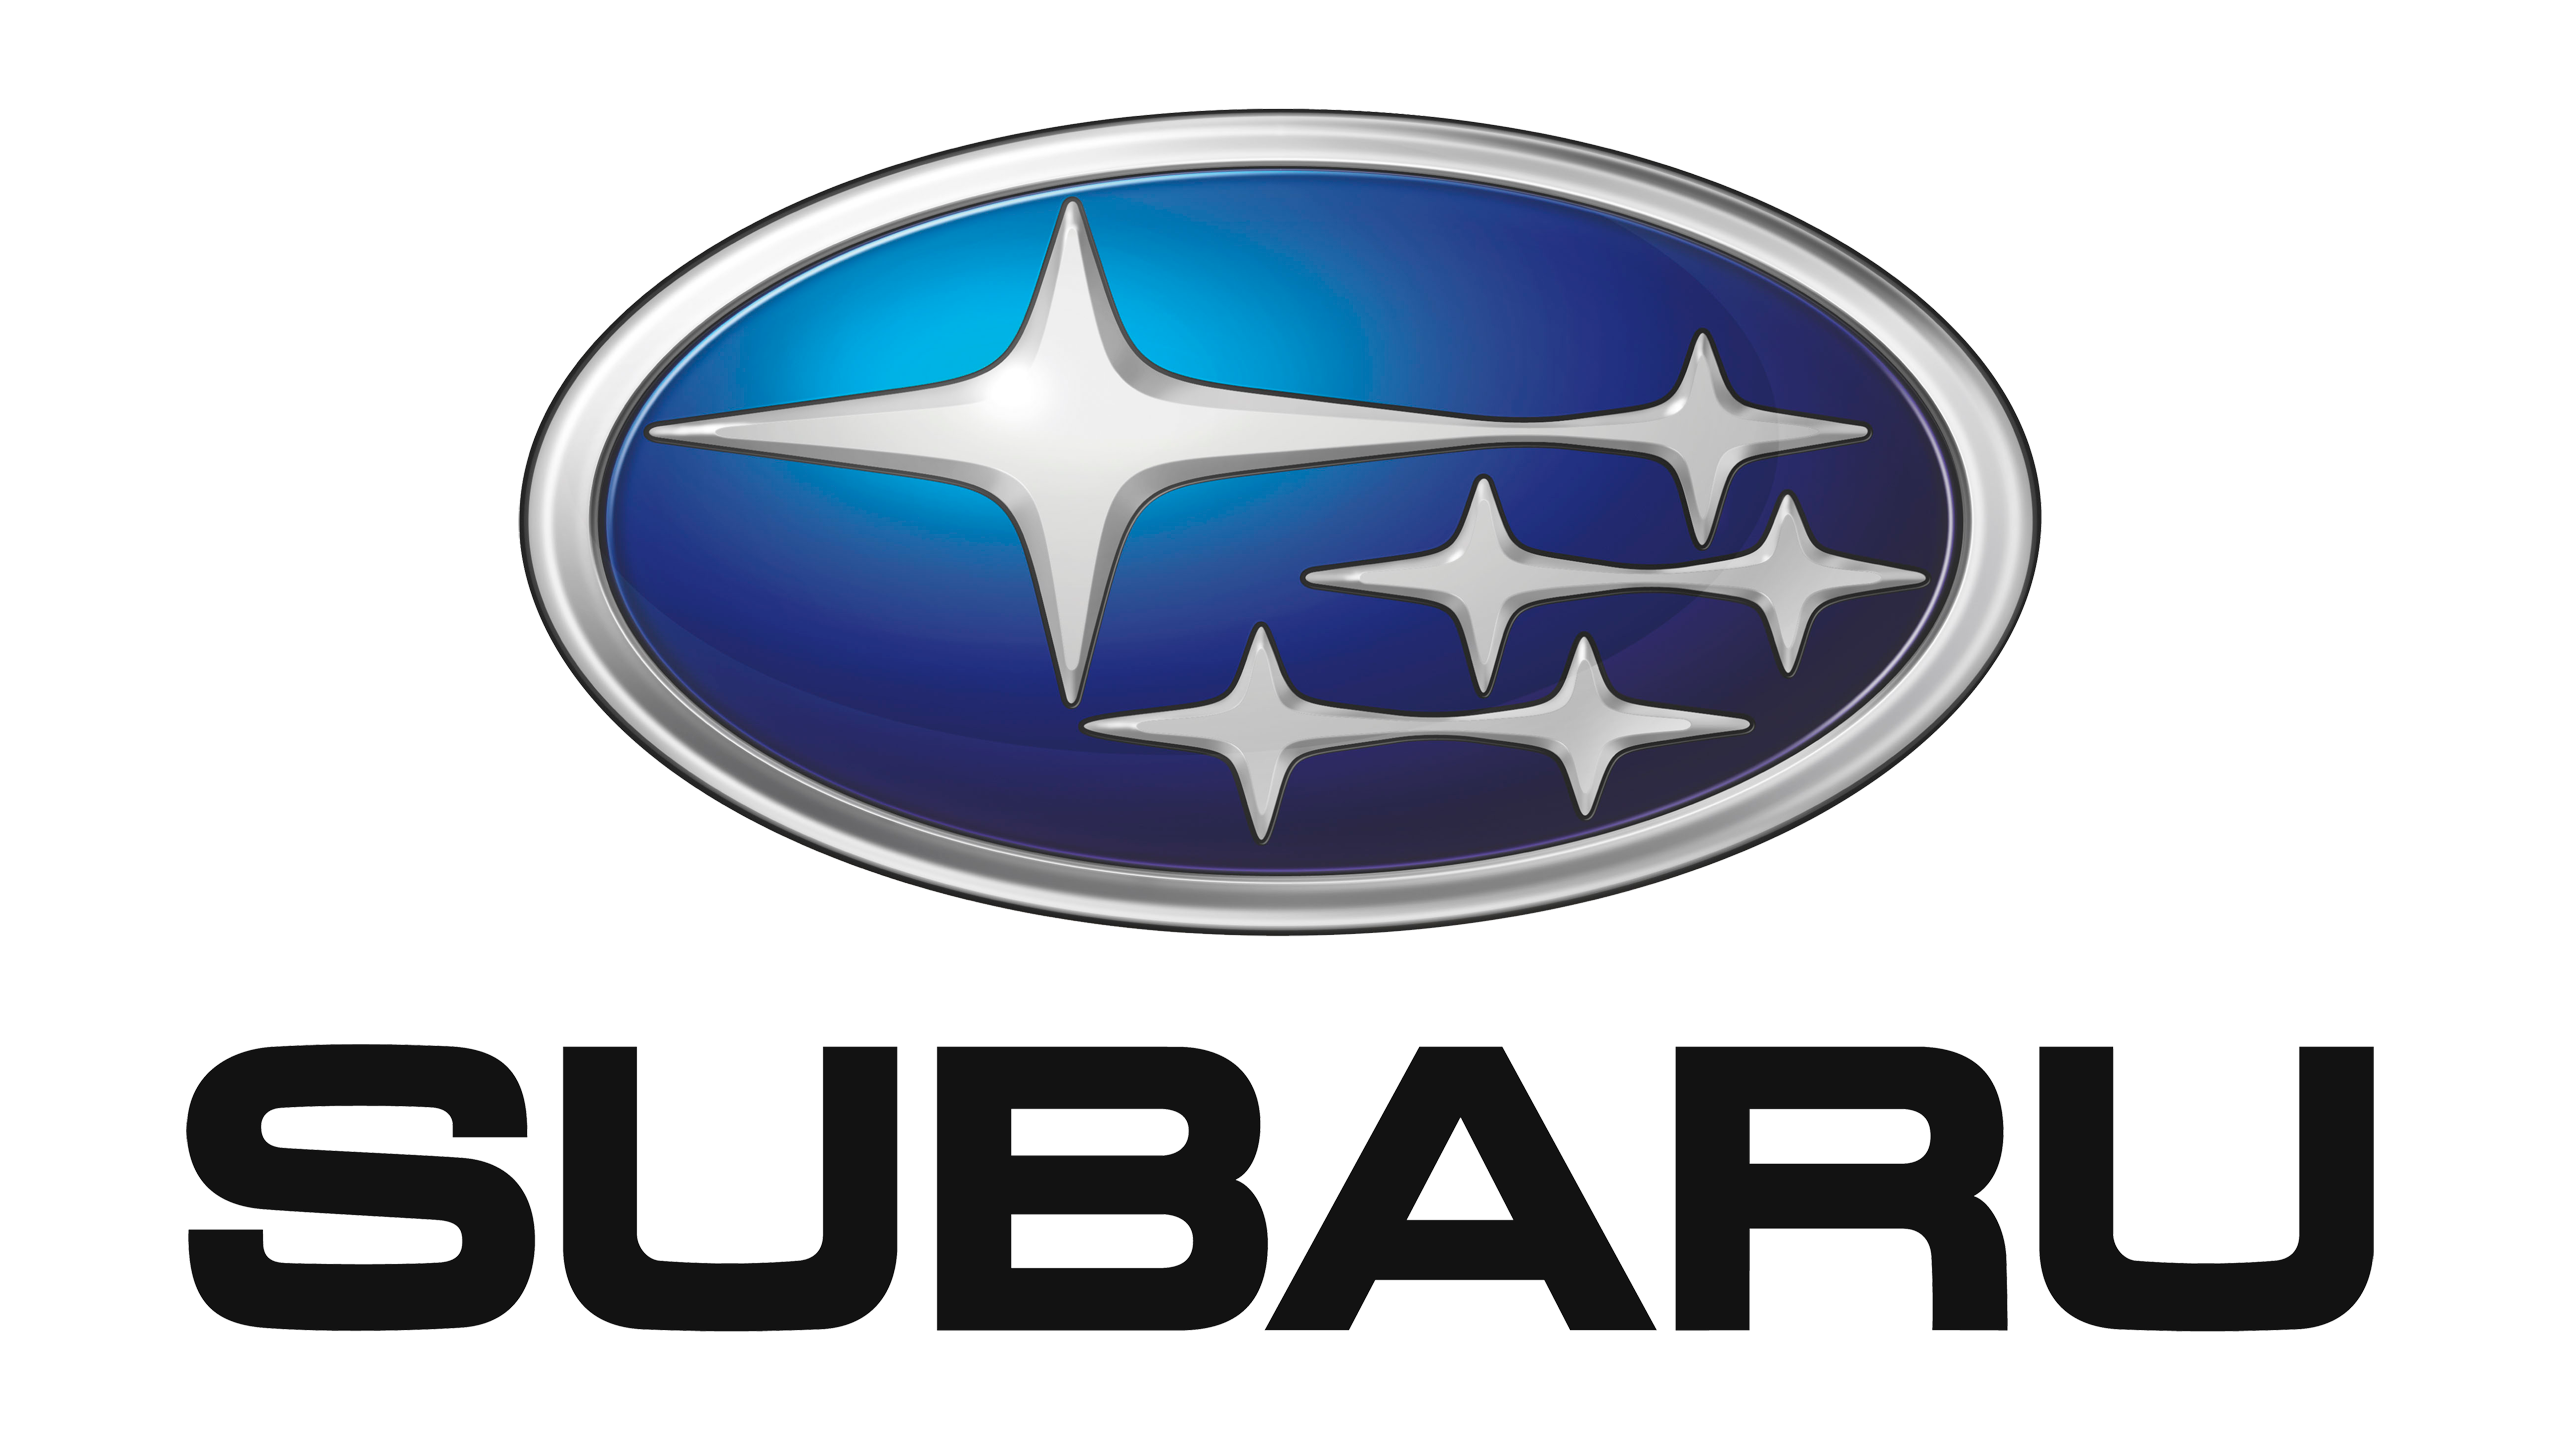 Best Resale Value Car Brand: Subaru